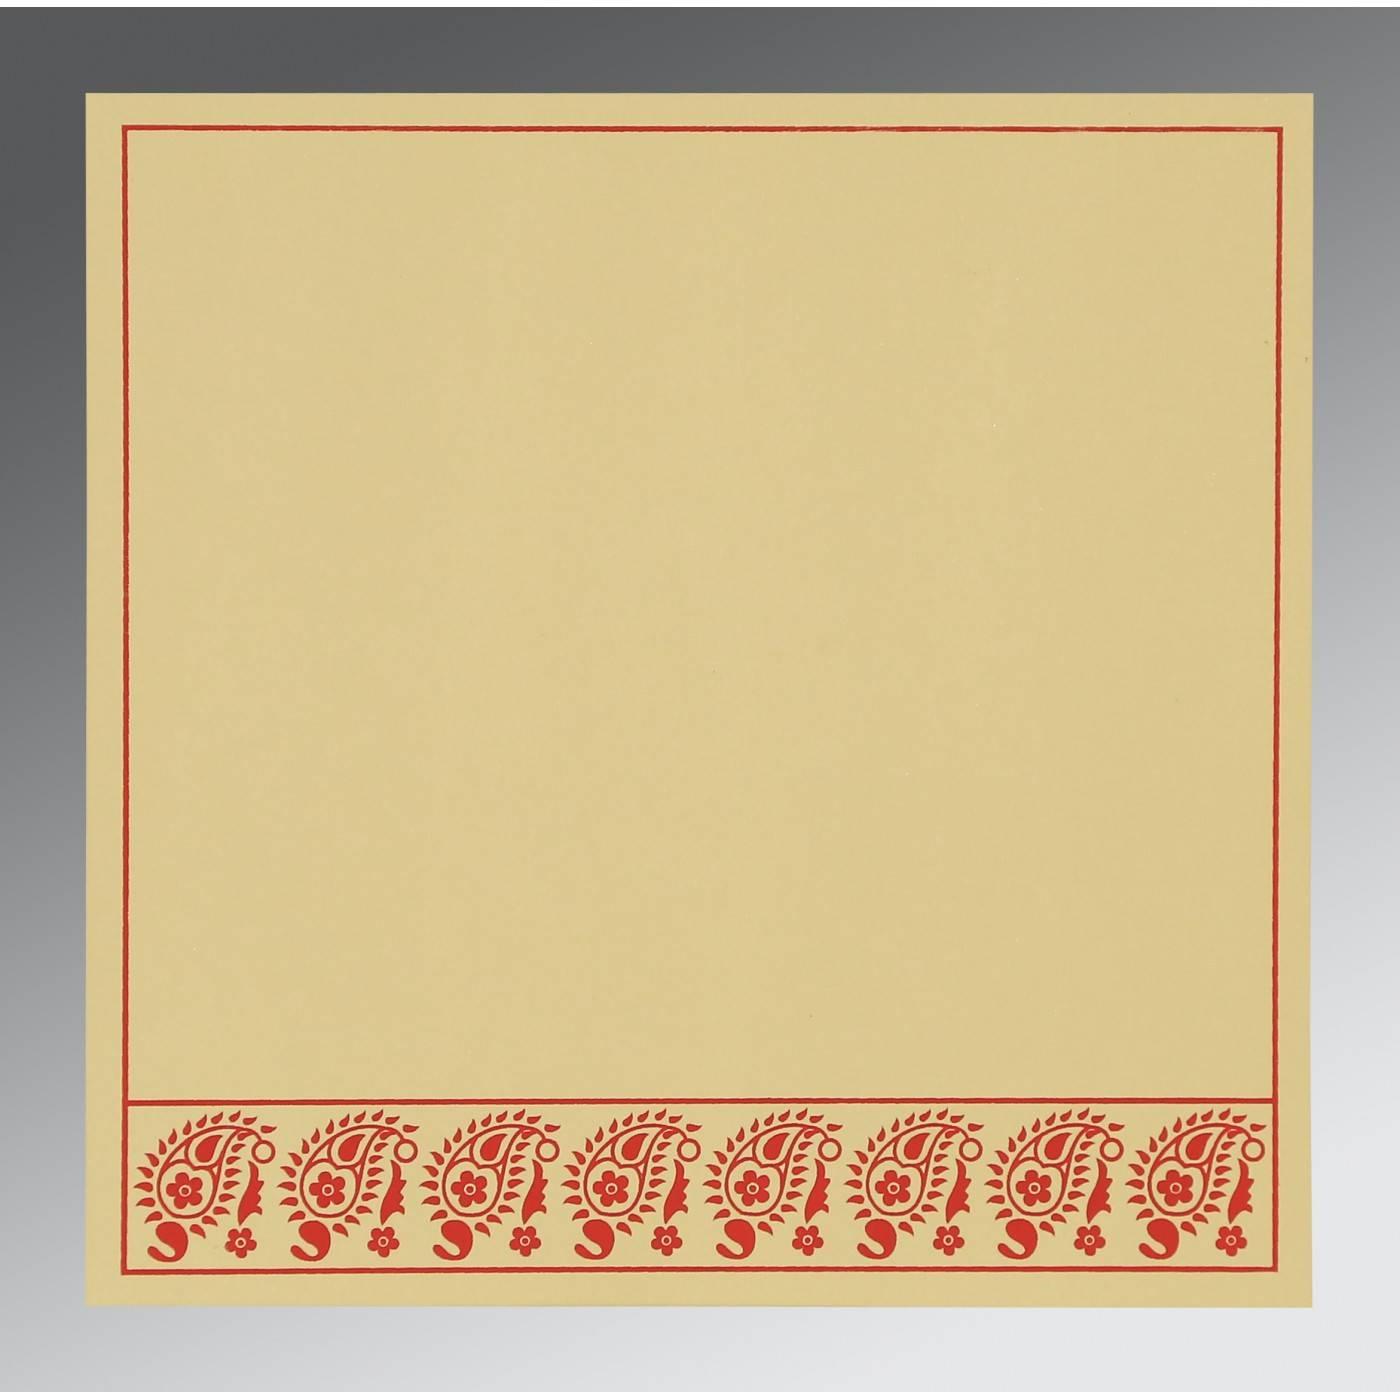 MUSTARD YELLOW WOOLY FLORAL THEMED - SCREEN PRINTED WEDDING CARD : CG-8218B - IndianWeddingCards